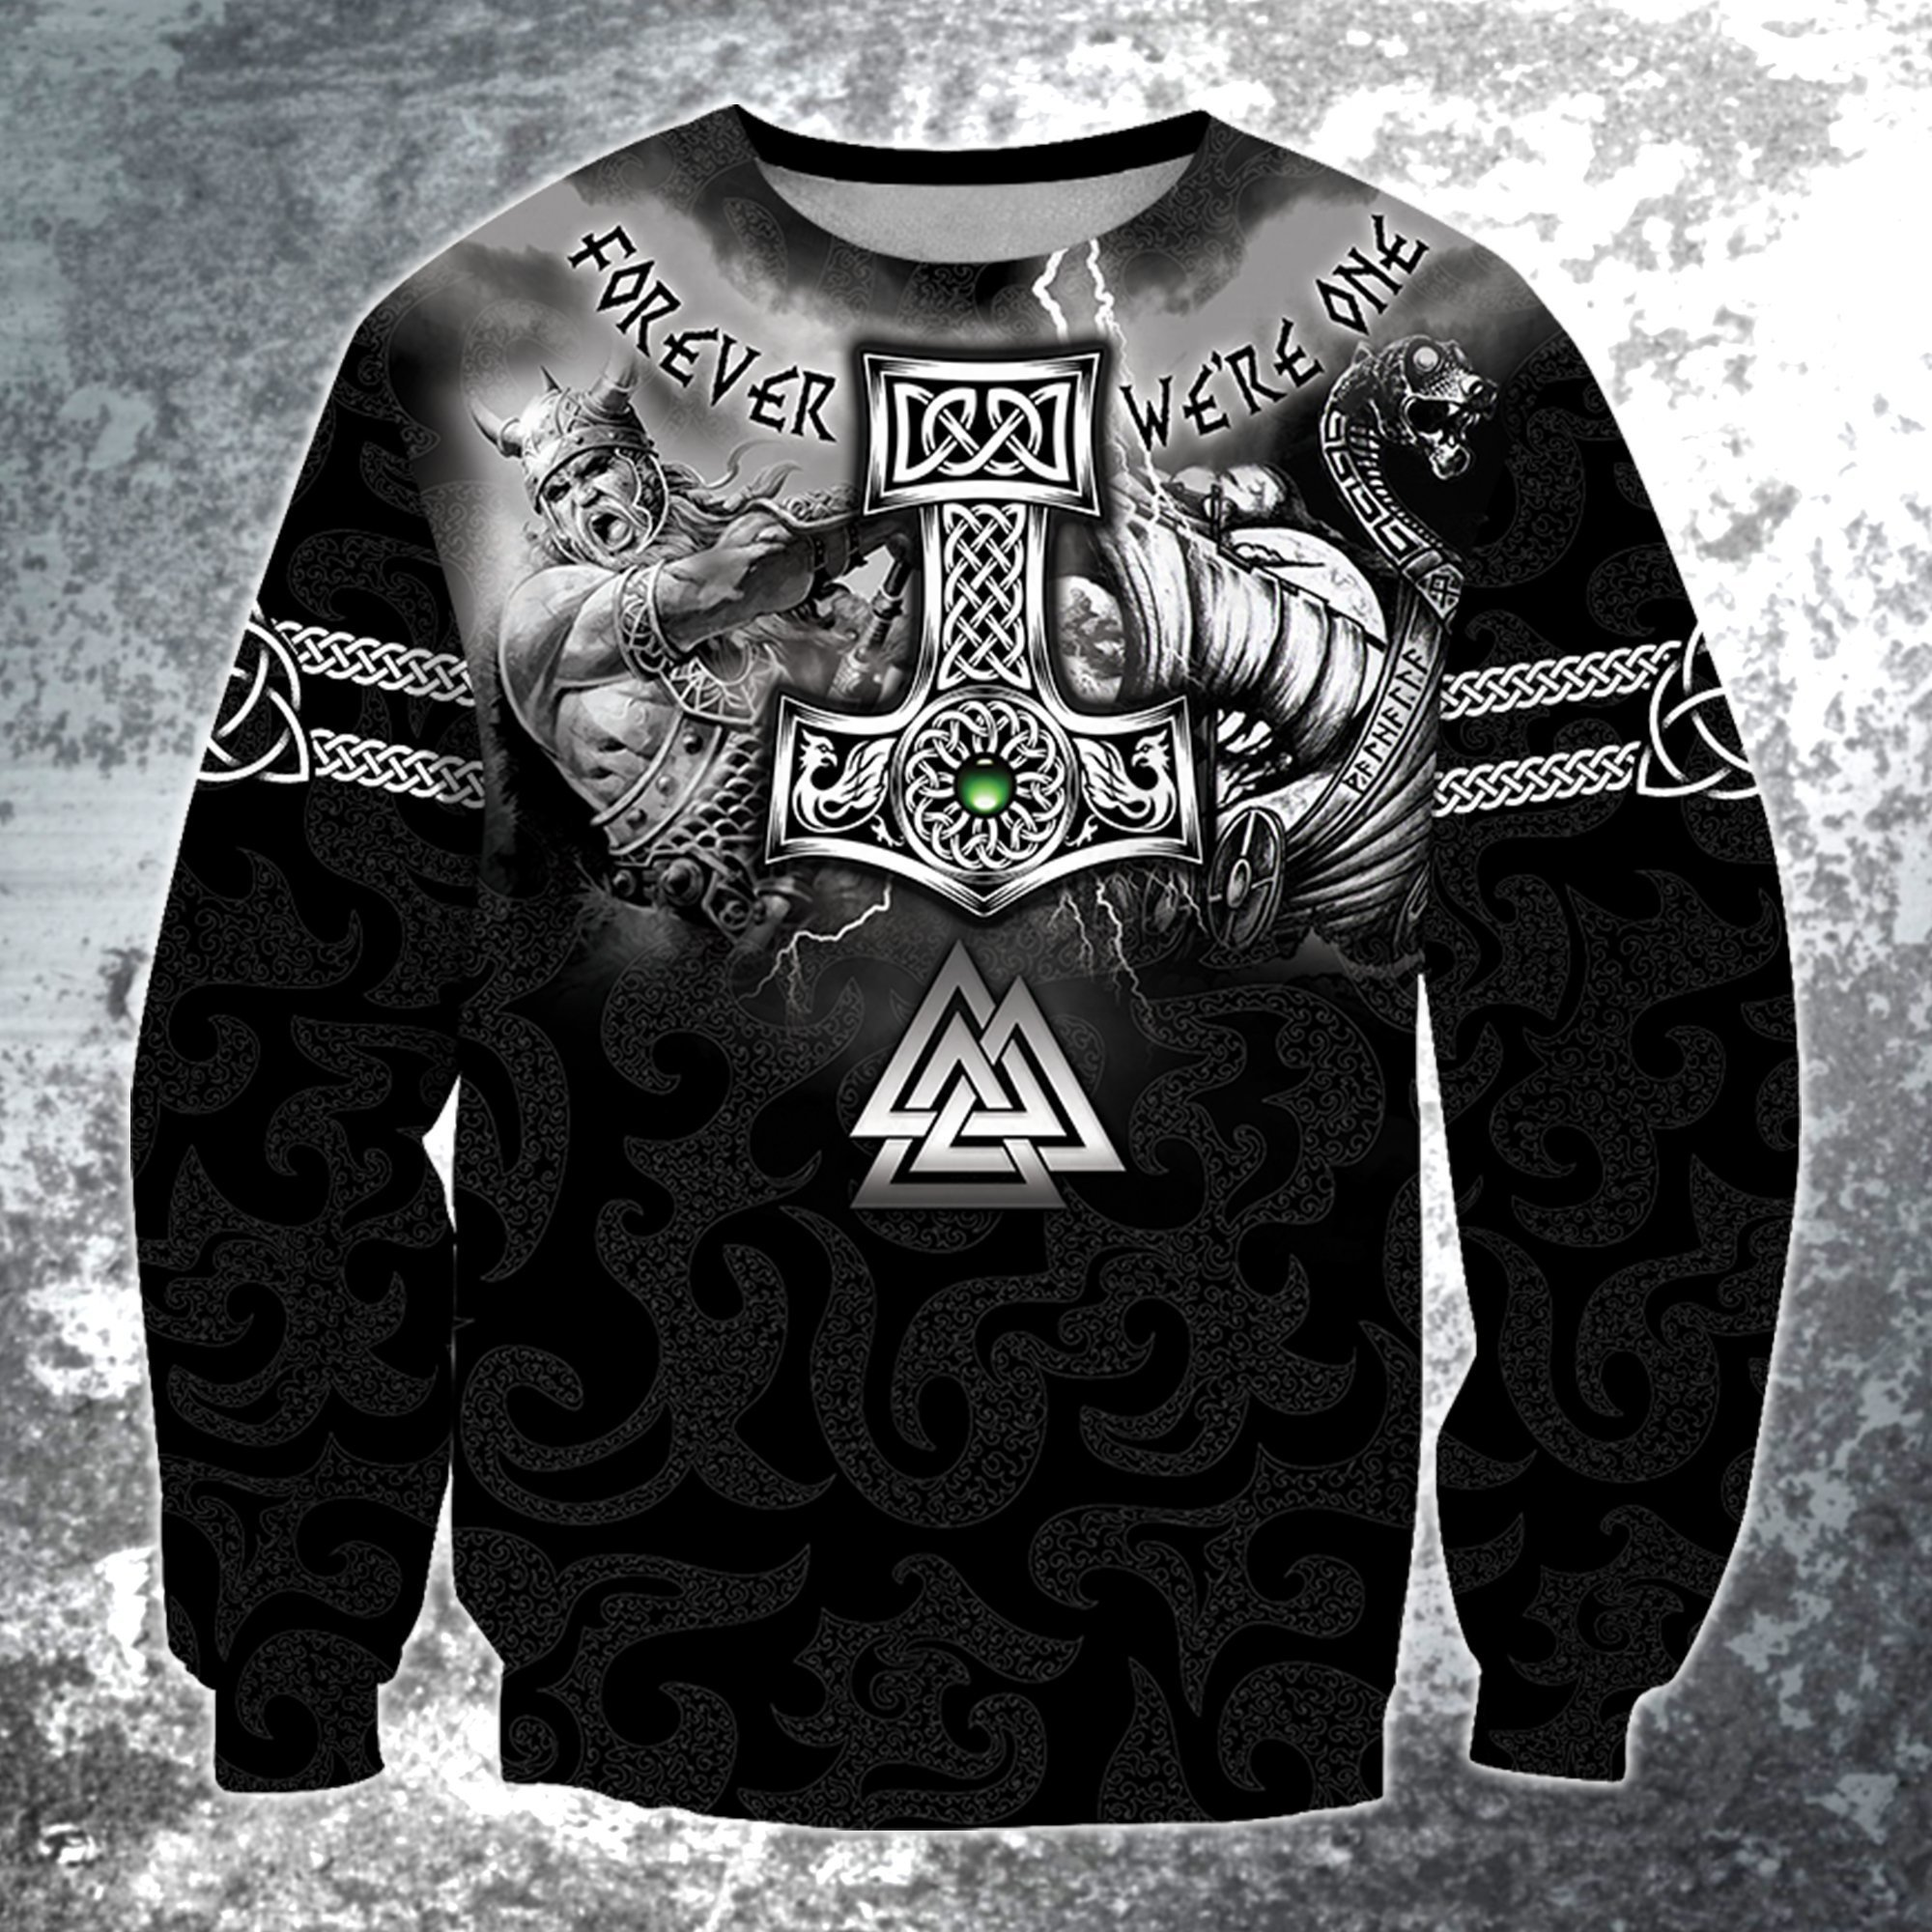 Hammer of thor forever we are one viking full printing sweatshirt 1